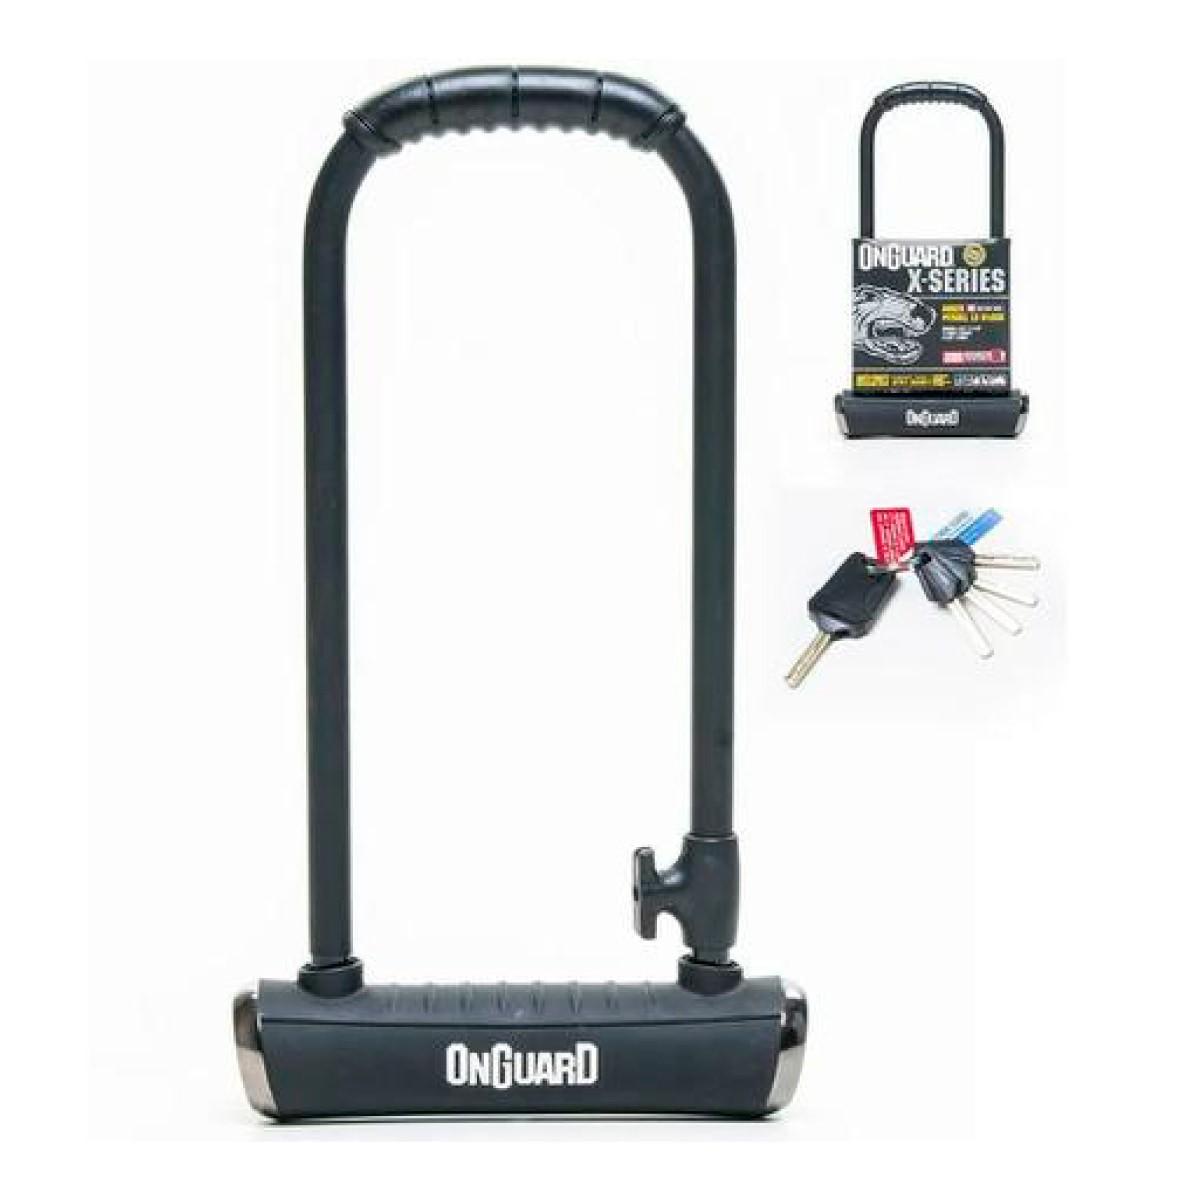 Cadeado U-Lock Onguard Pitbull 8002 Preto